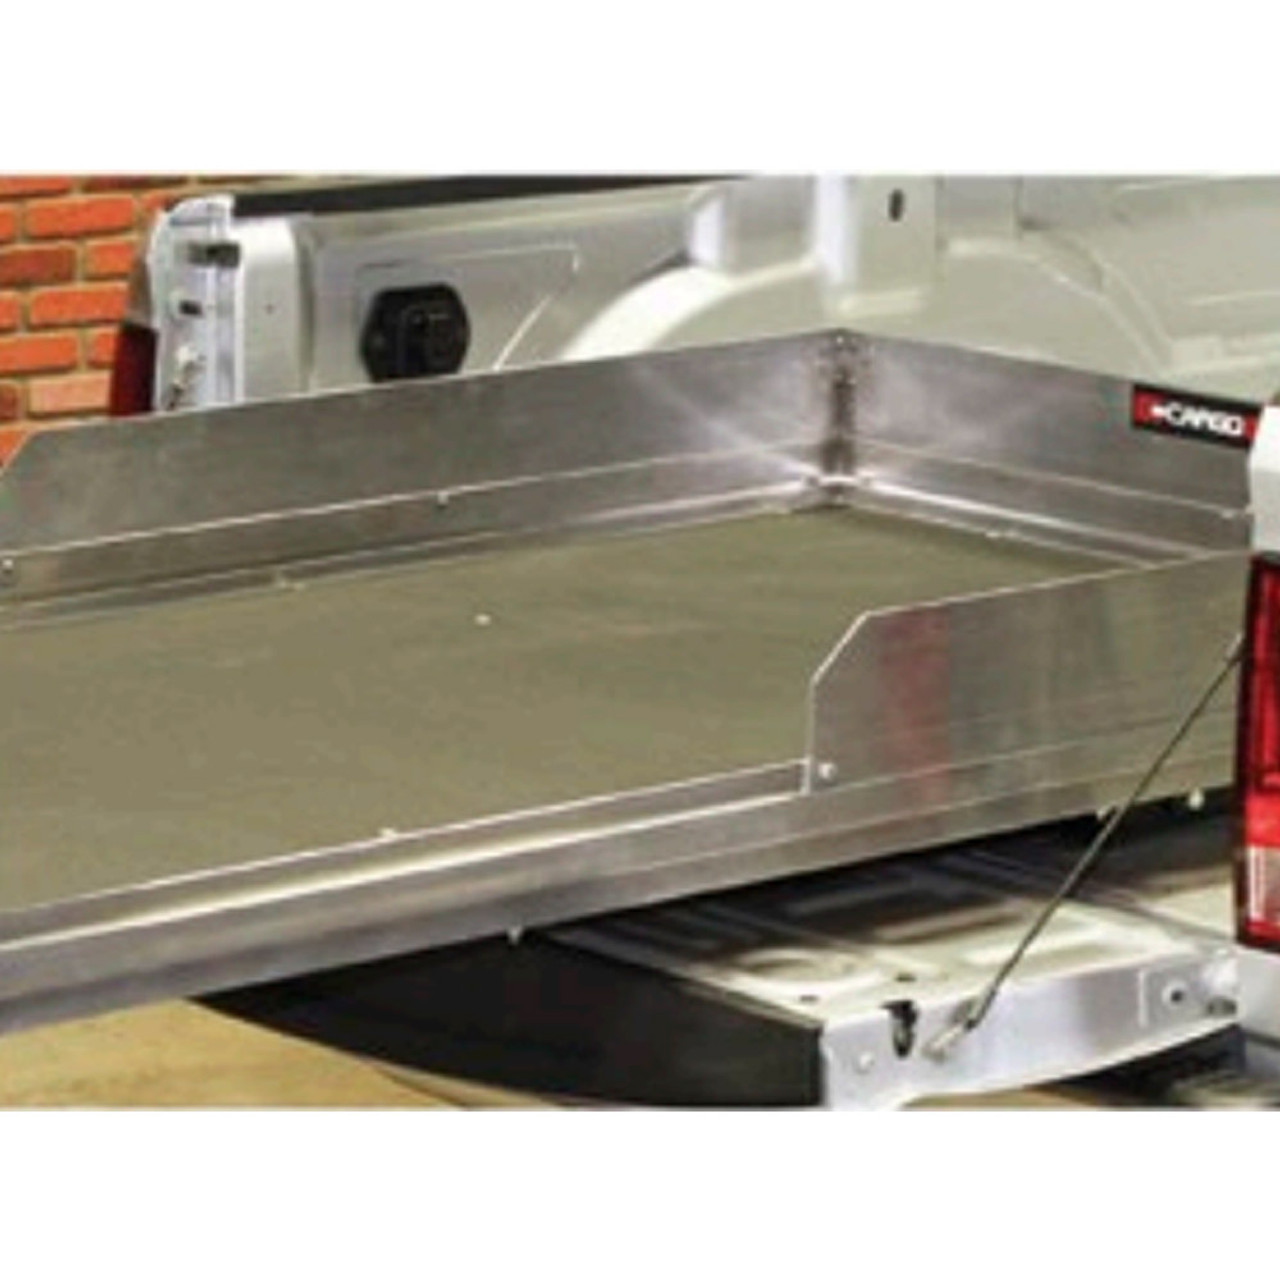 "Cargo-Glide CGHS 8"" High-Sides, 48""Long, choose Powder Coated Black or  Aluminum, Standard Kit"